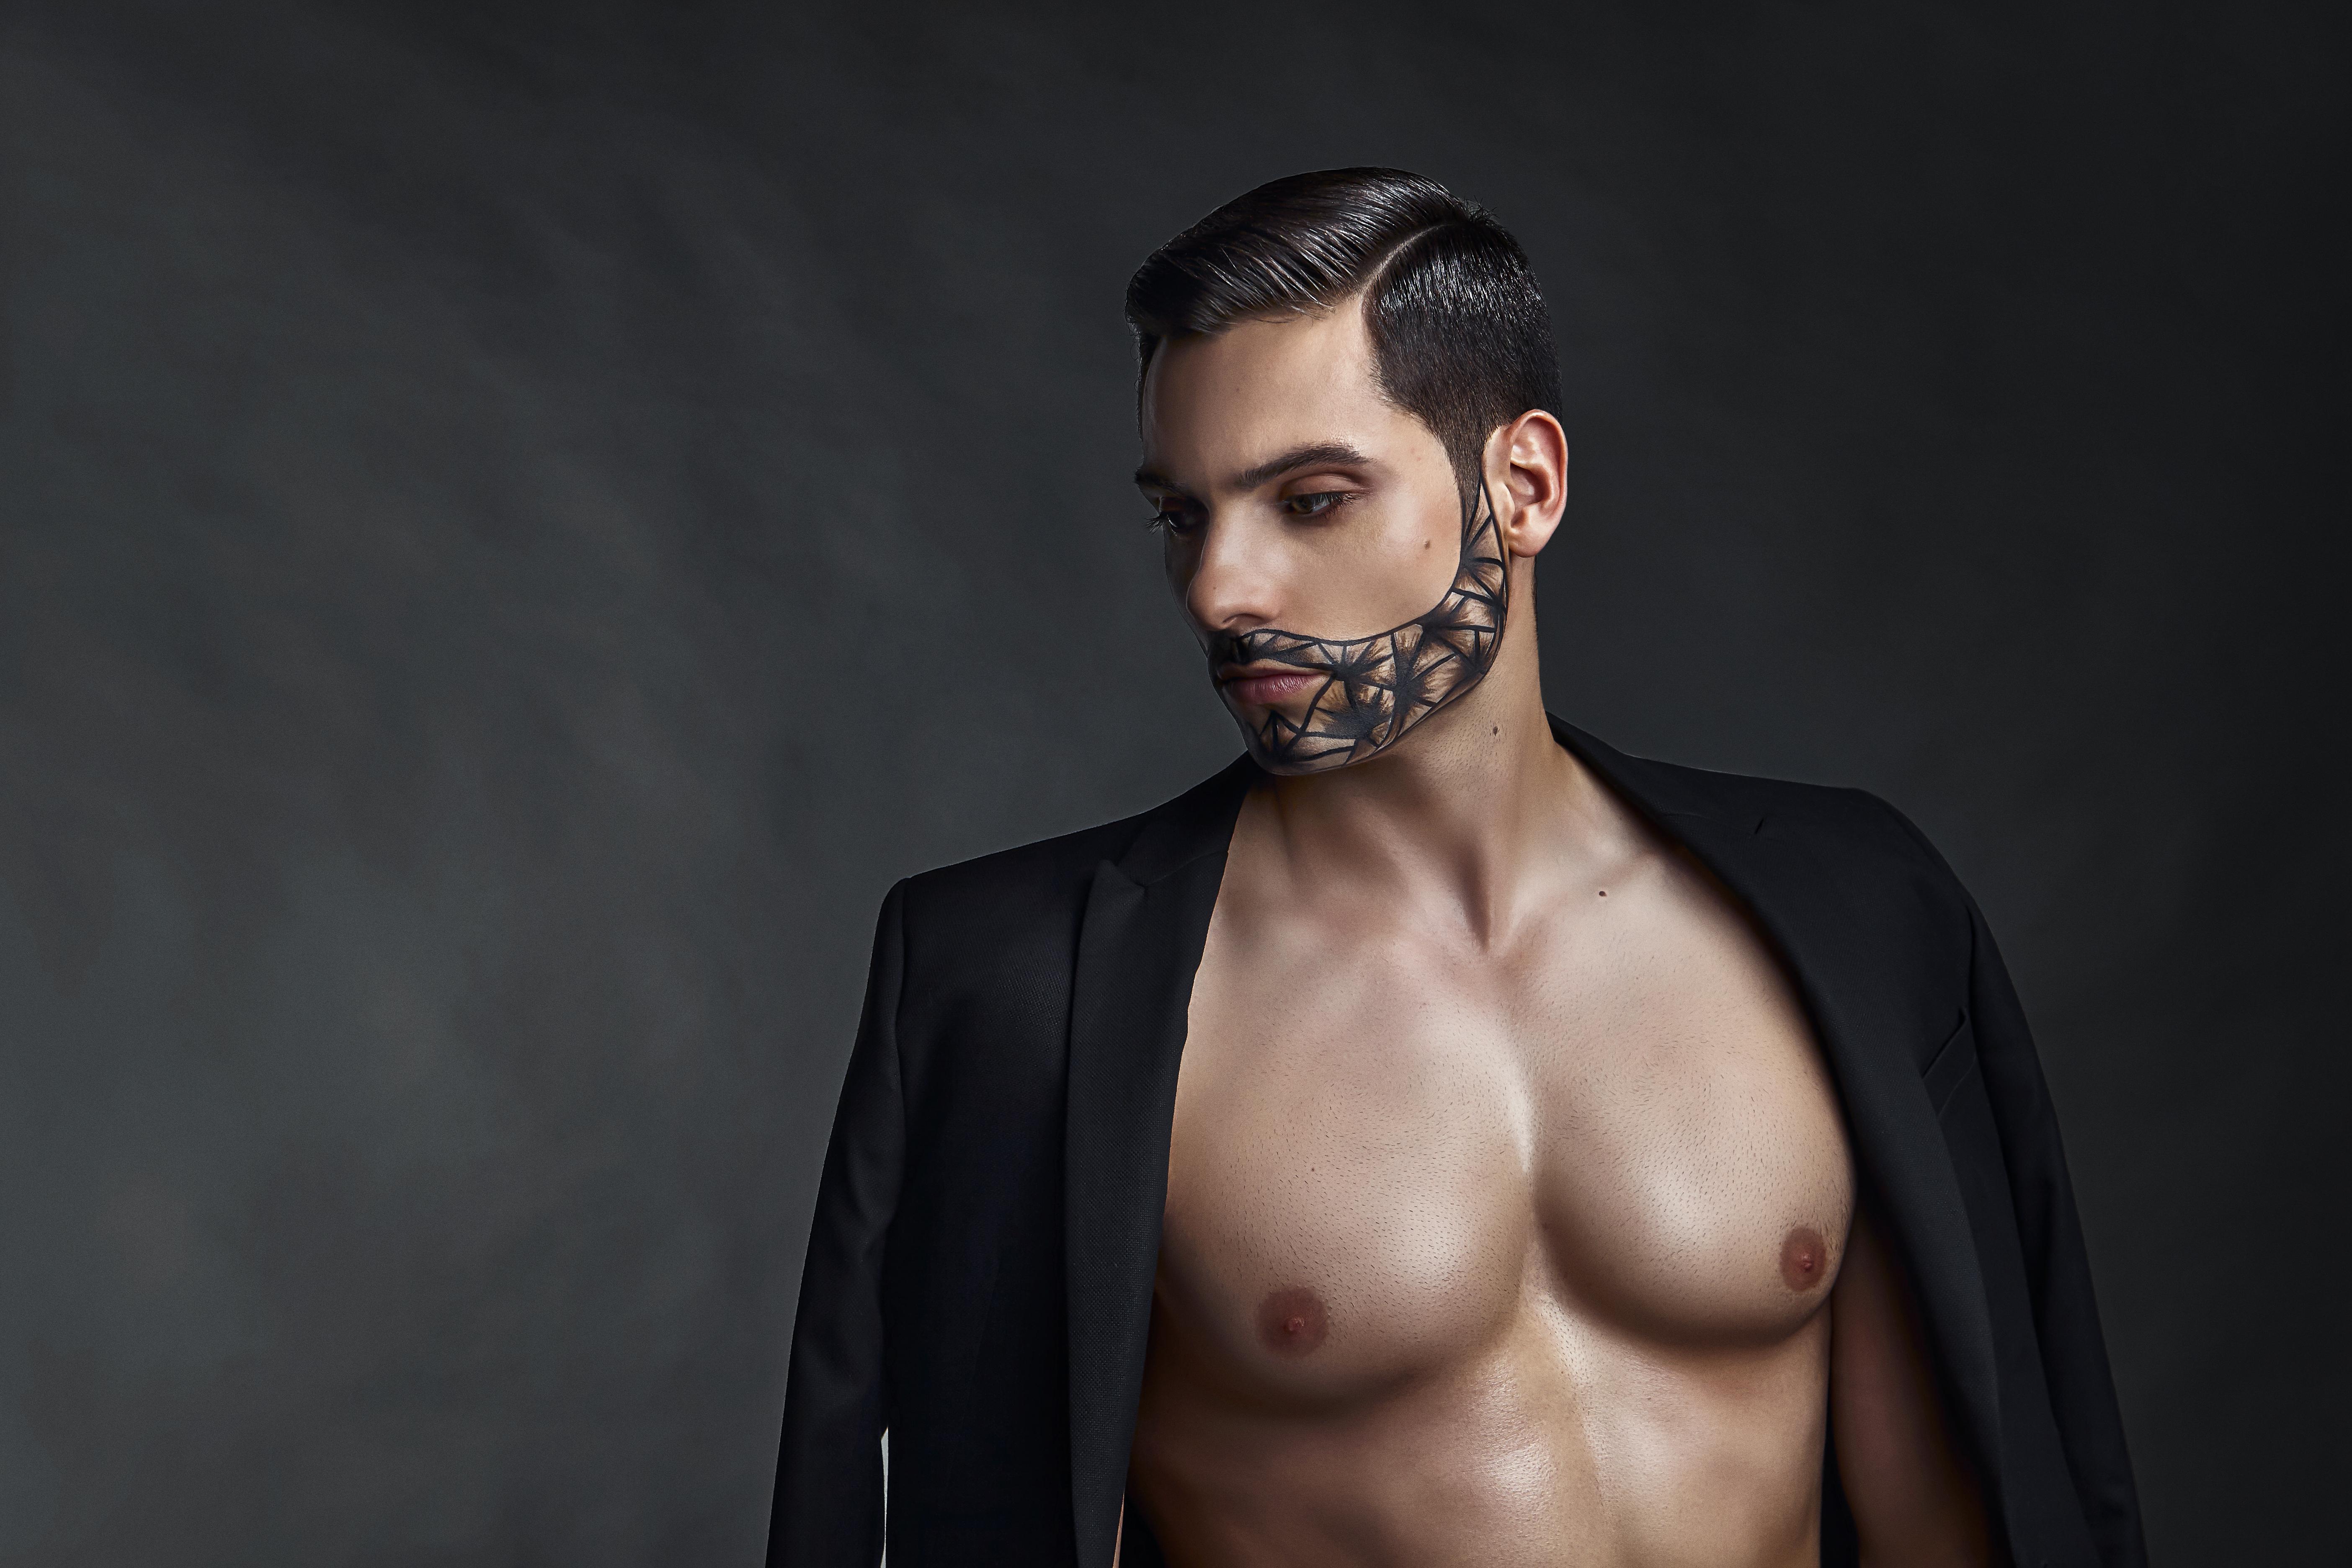 Coiffure et direction artistique : Richard Bajon, maquillage : Romina Allio et Laetitia Majer, photos : Joel Dart, retouches : José Aleixo